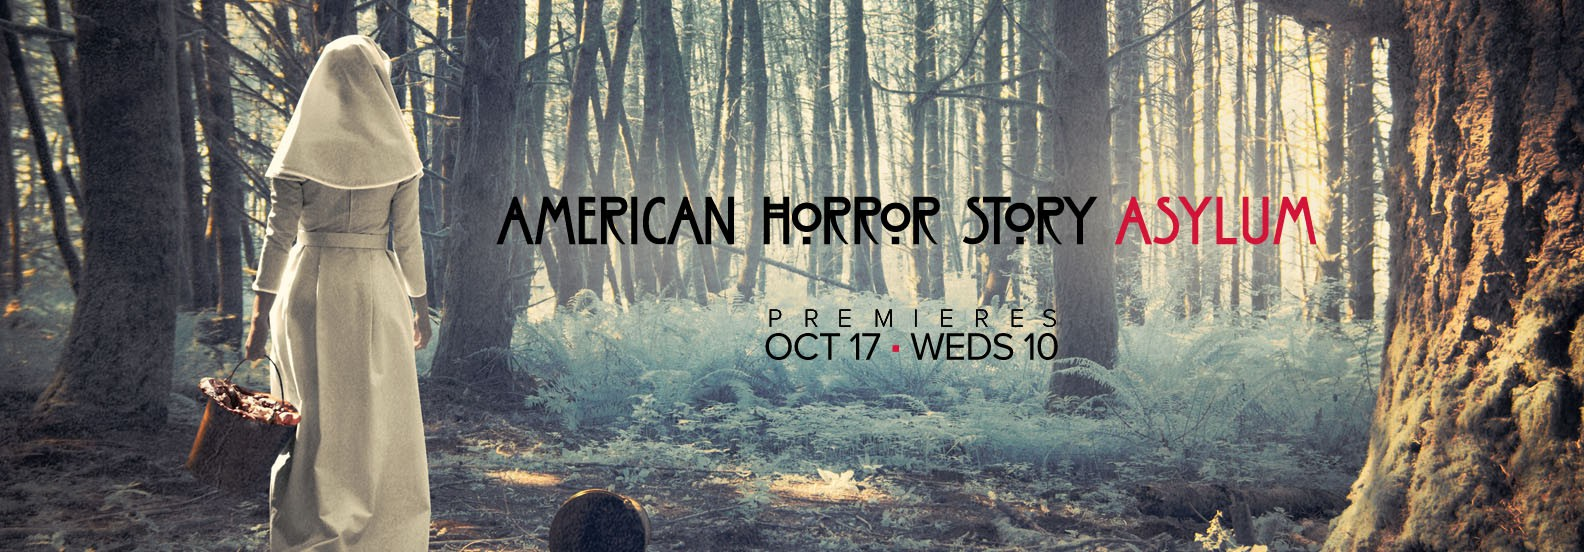 American-Horror-Story-Asylum-american-horror-story-32431054-1600-1200